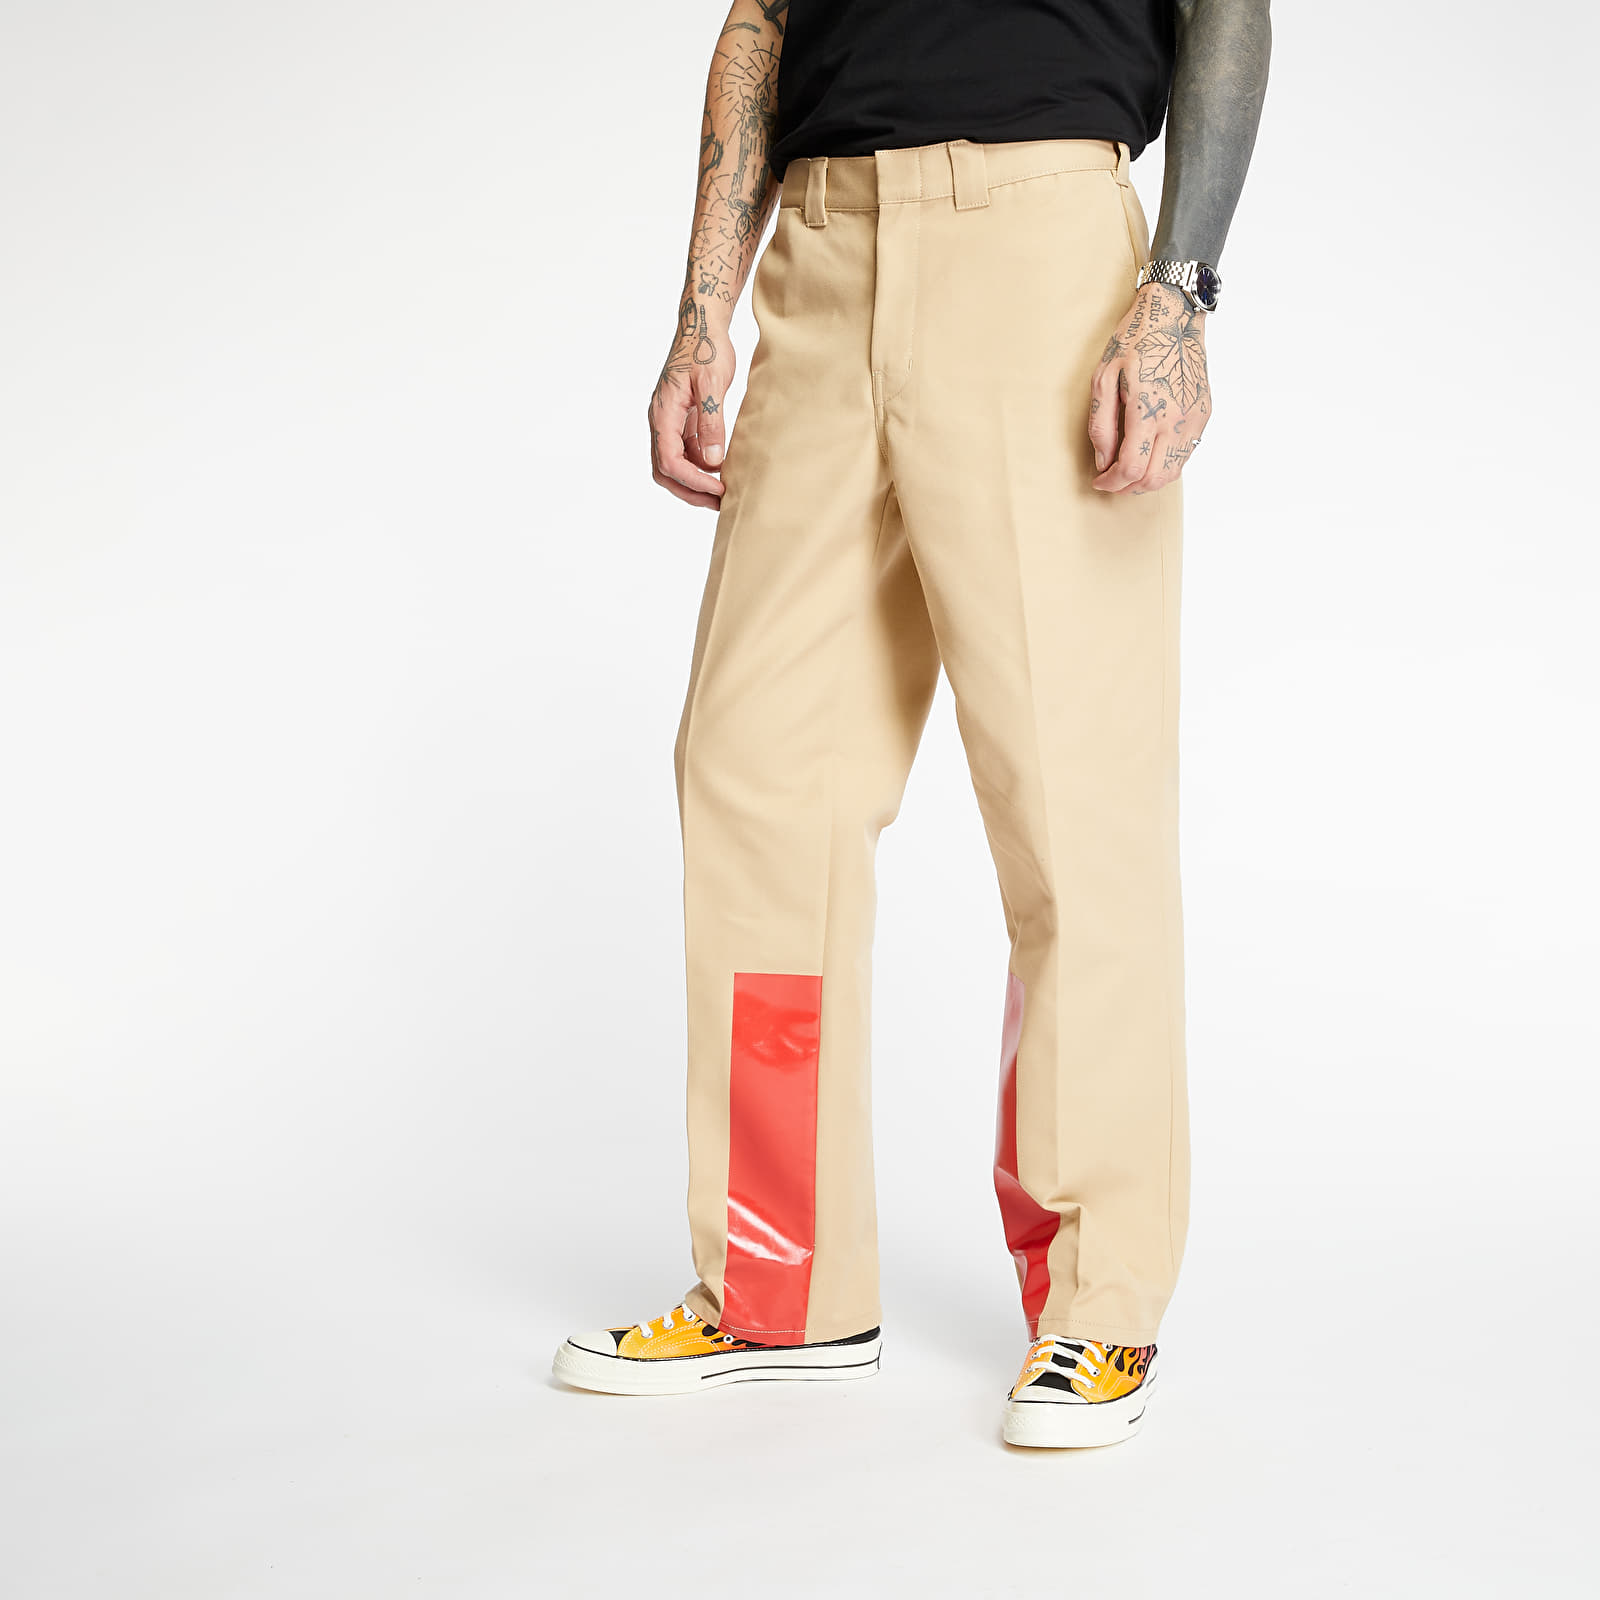 HELMUT LANG Uniform Bar Heavy Pants Mortar, Brown